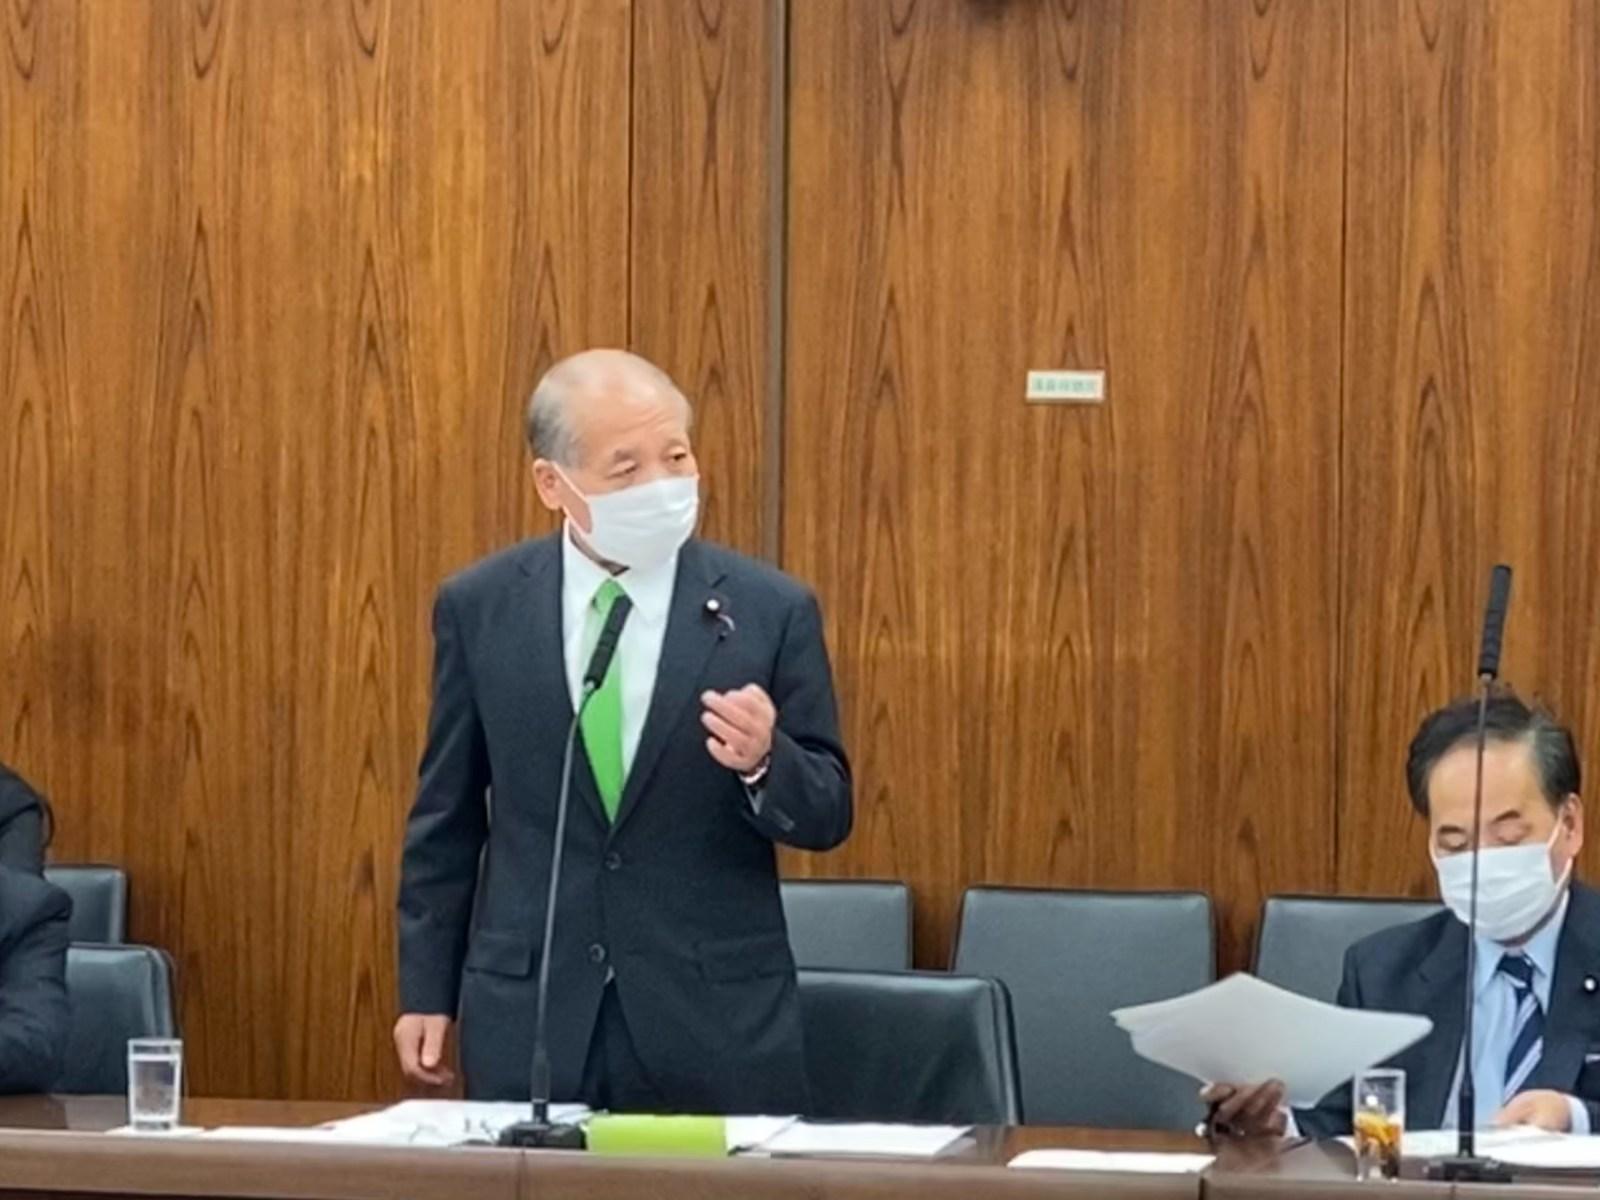 参議院議員鈴木宗男 質問第13号 日本共産党と破壊活動防止法に関する質問主意書